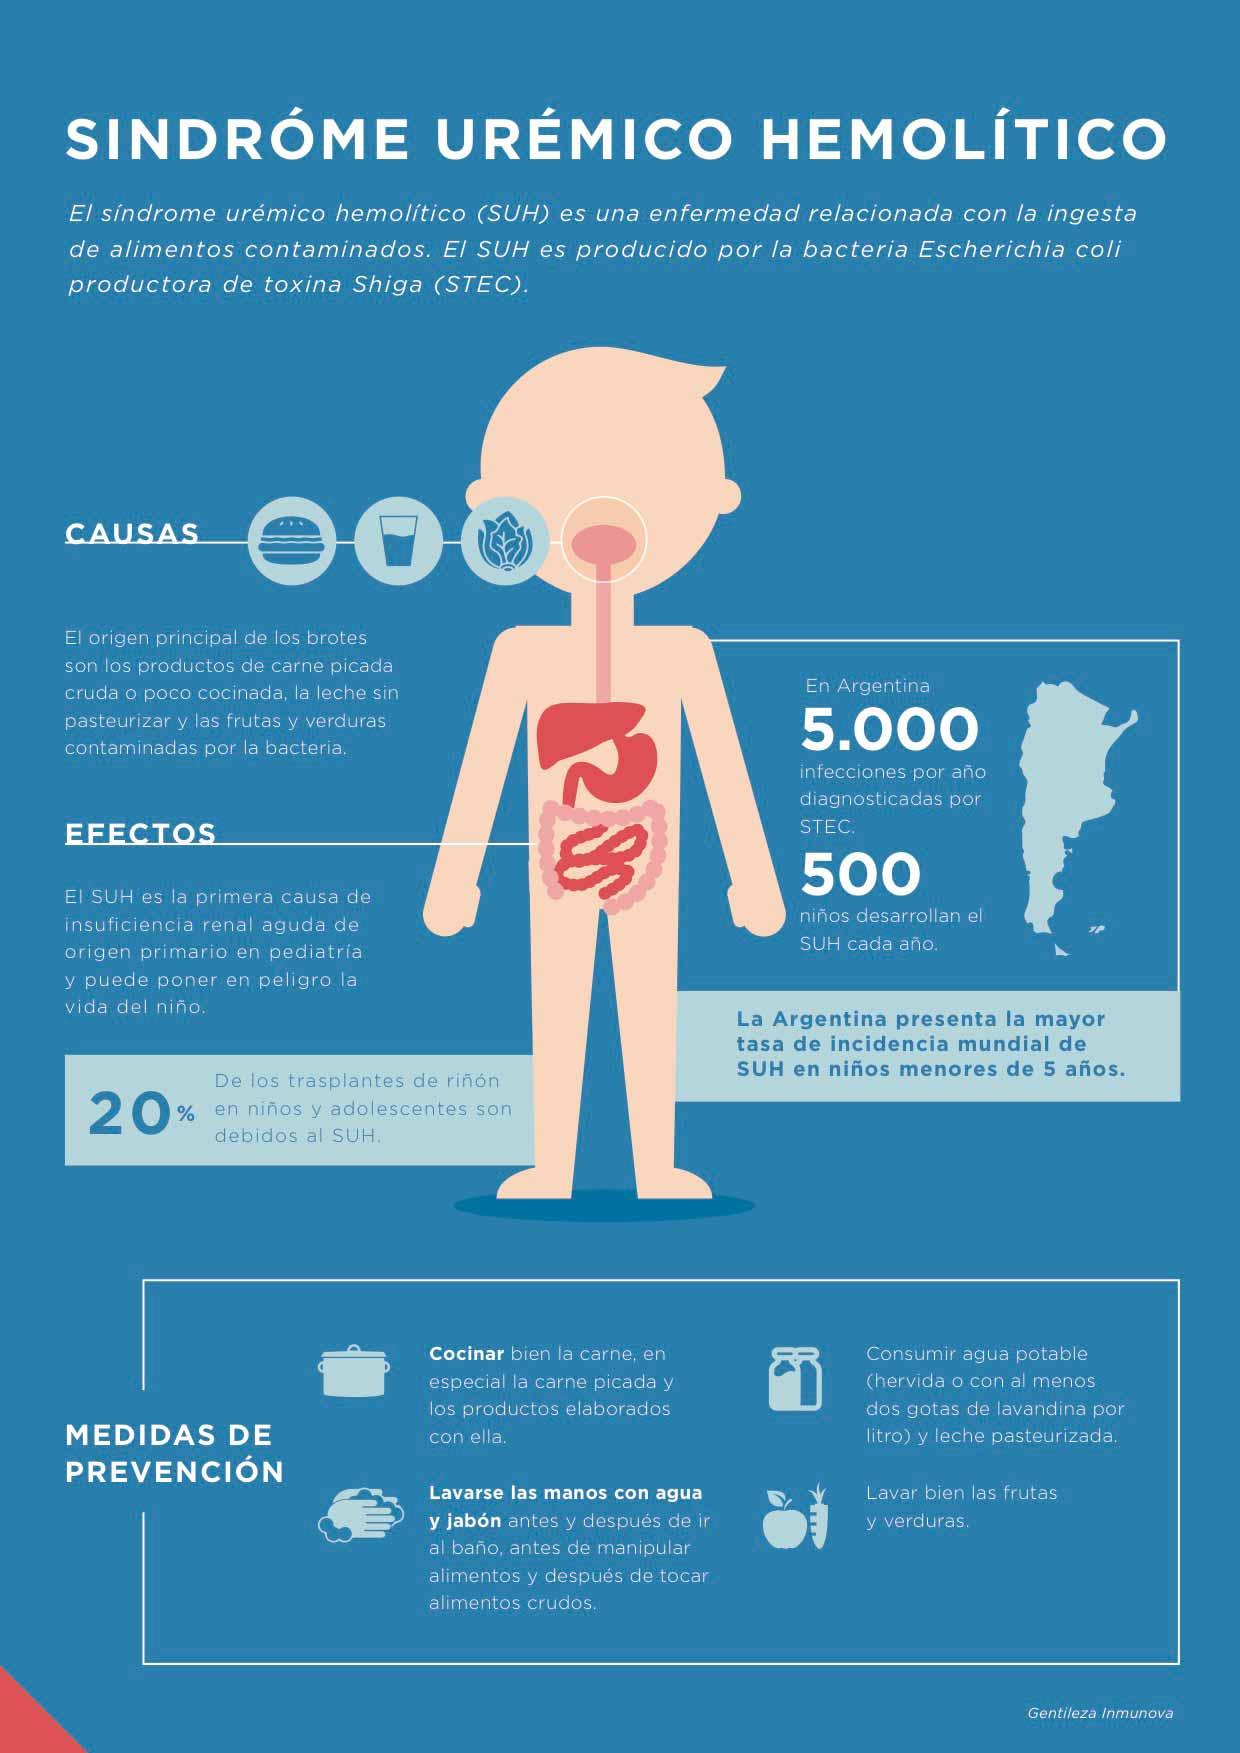 Fundacion-Leloir---sindrome-uremico-hemolitico